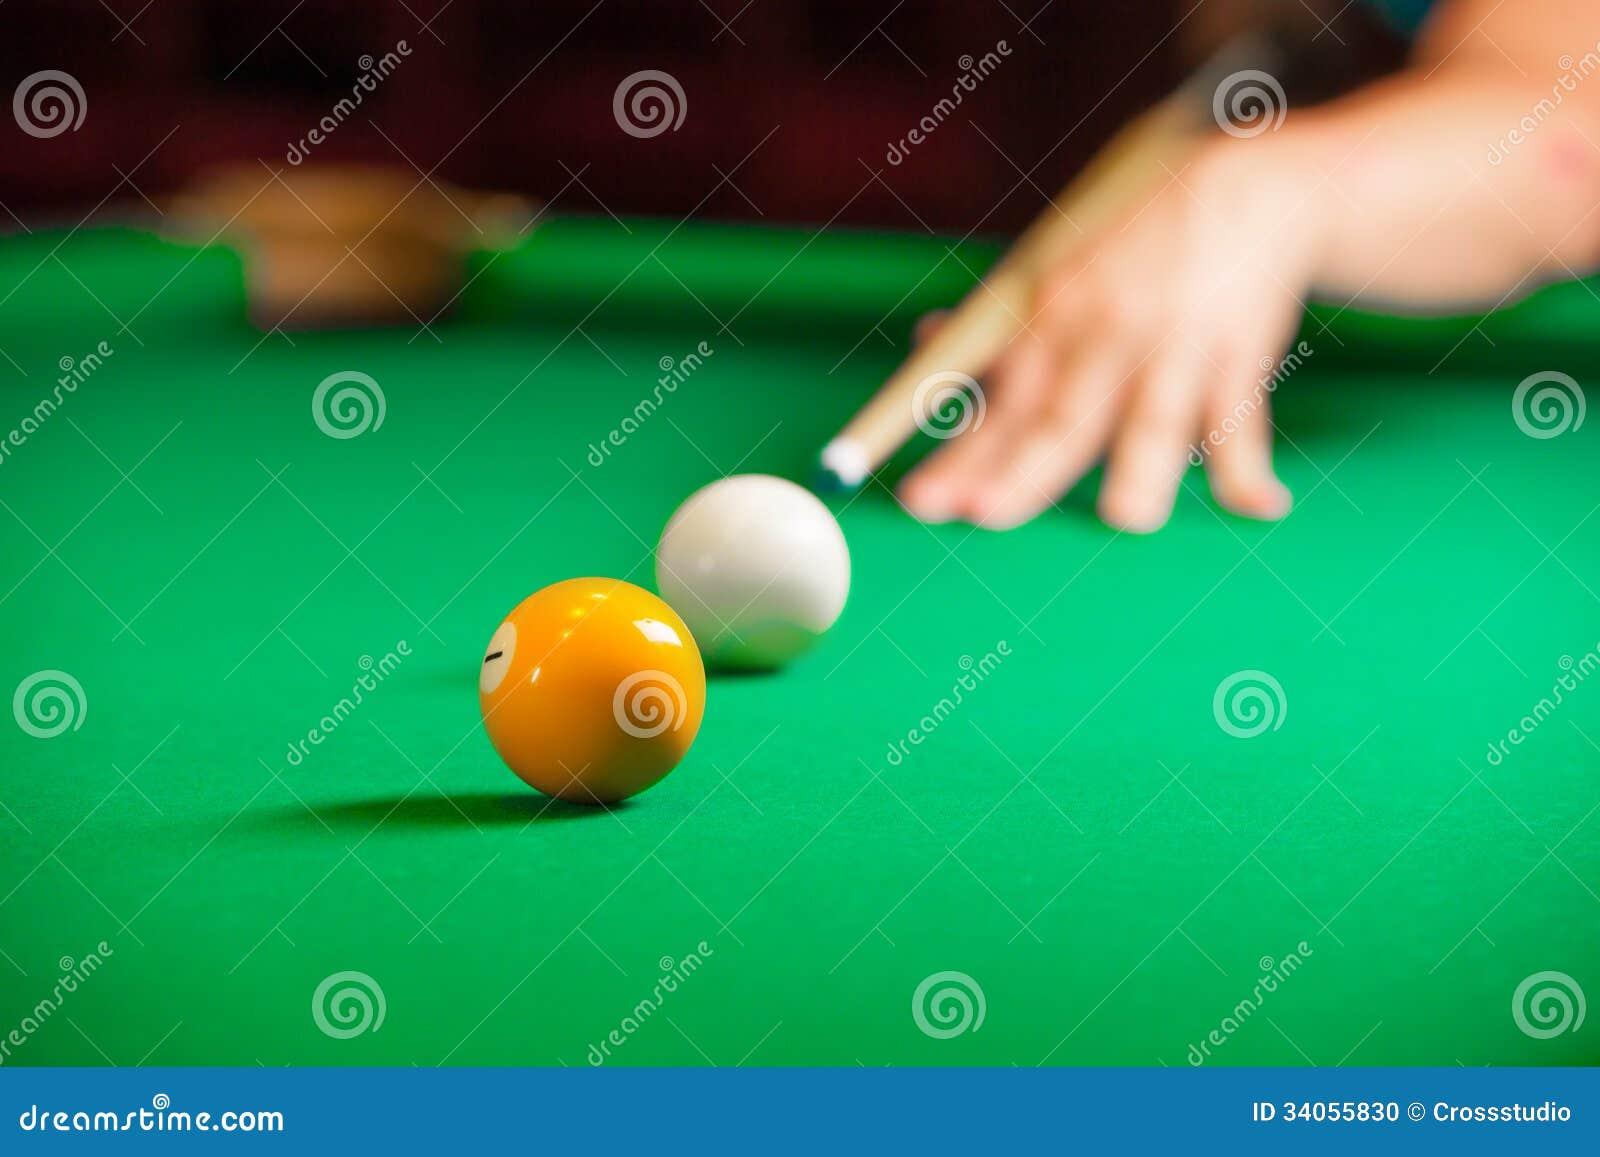 Playing Pool Stock Photo Image 34055830